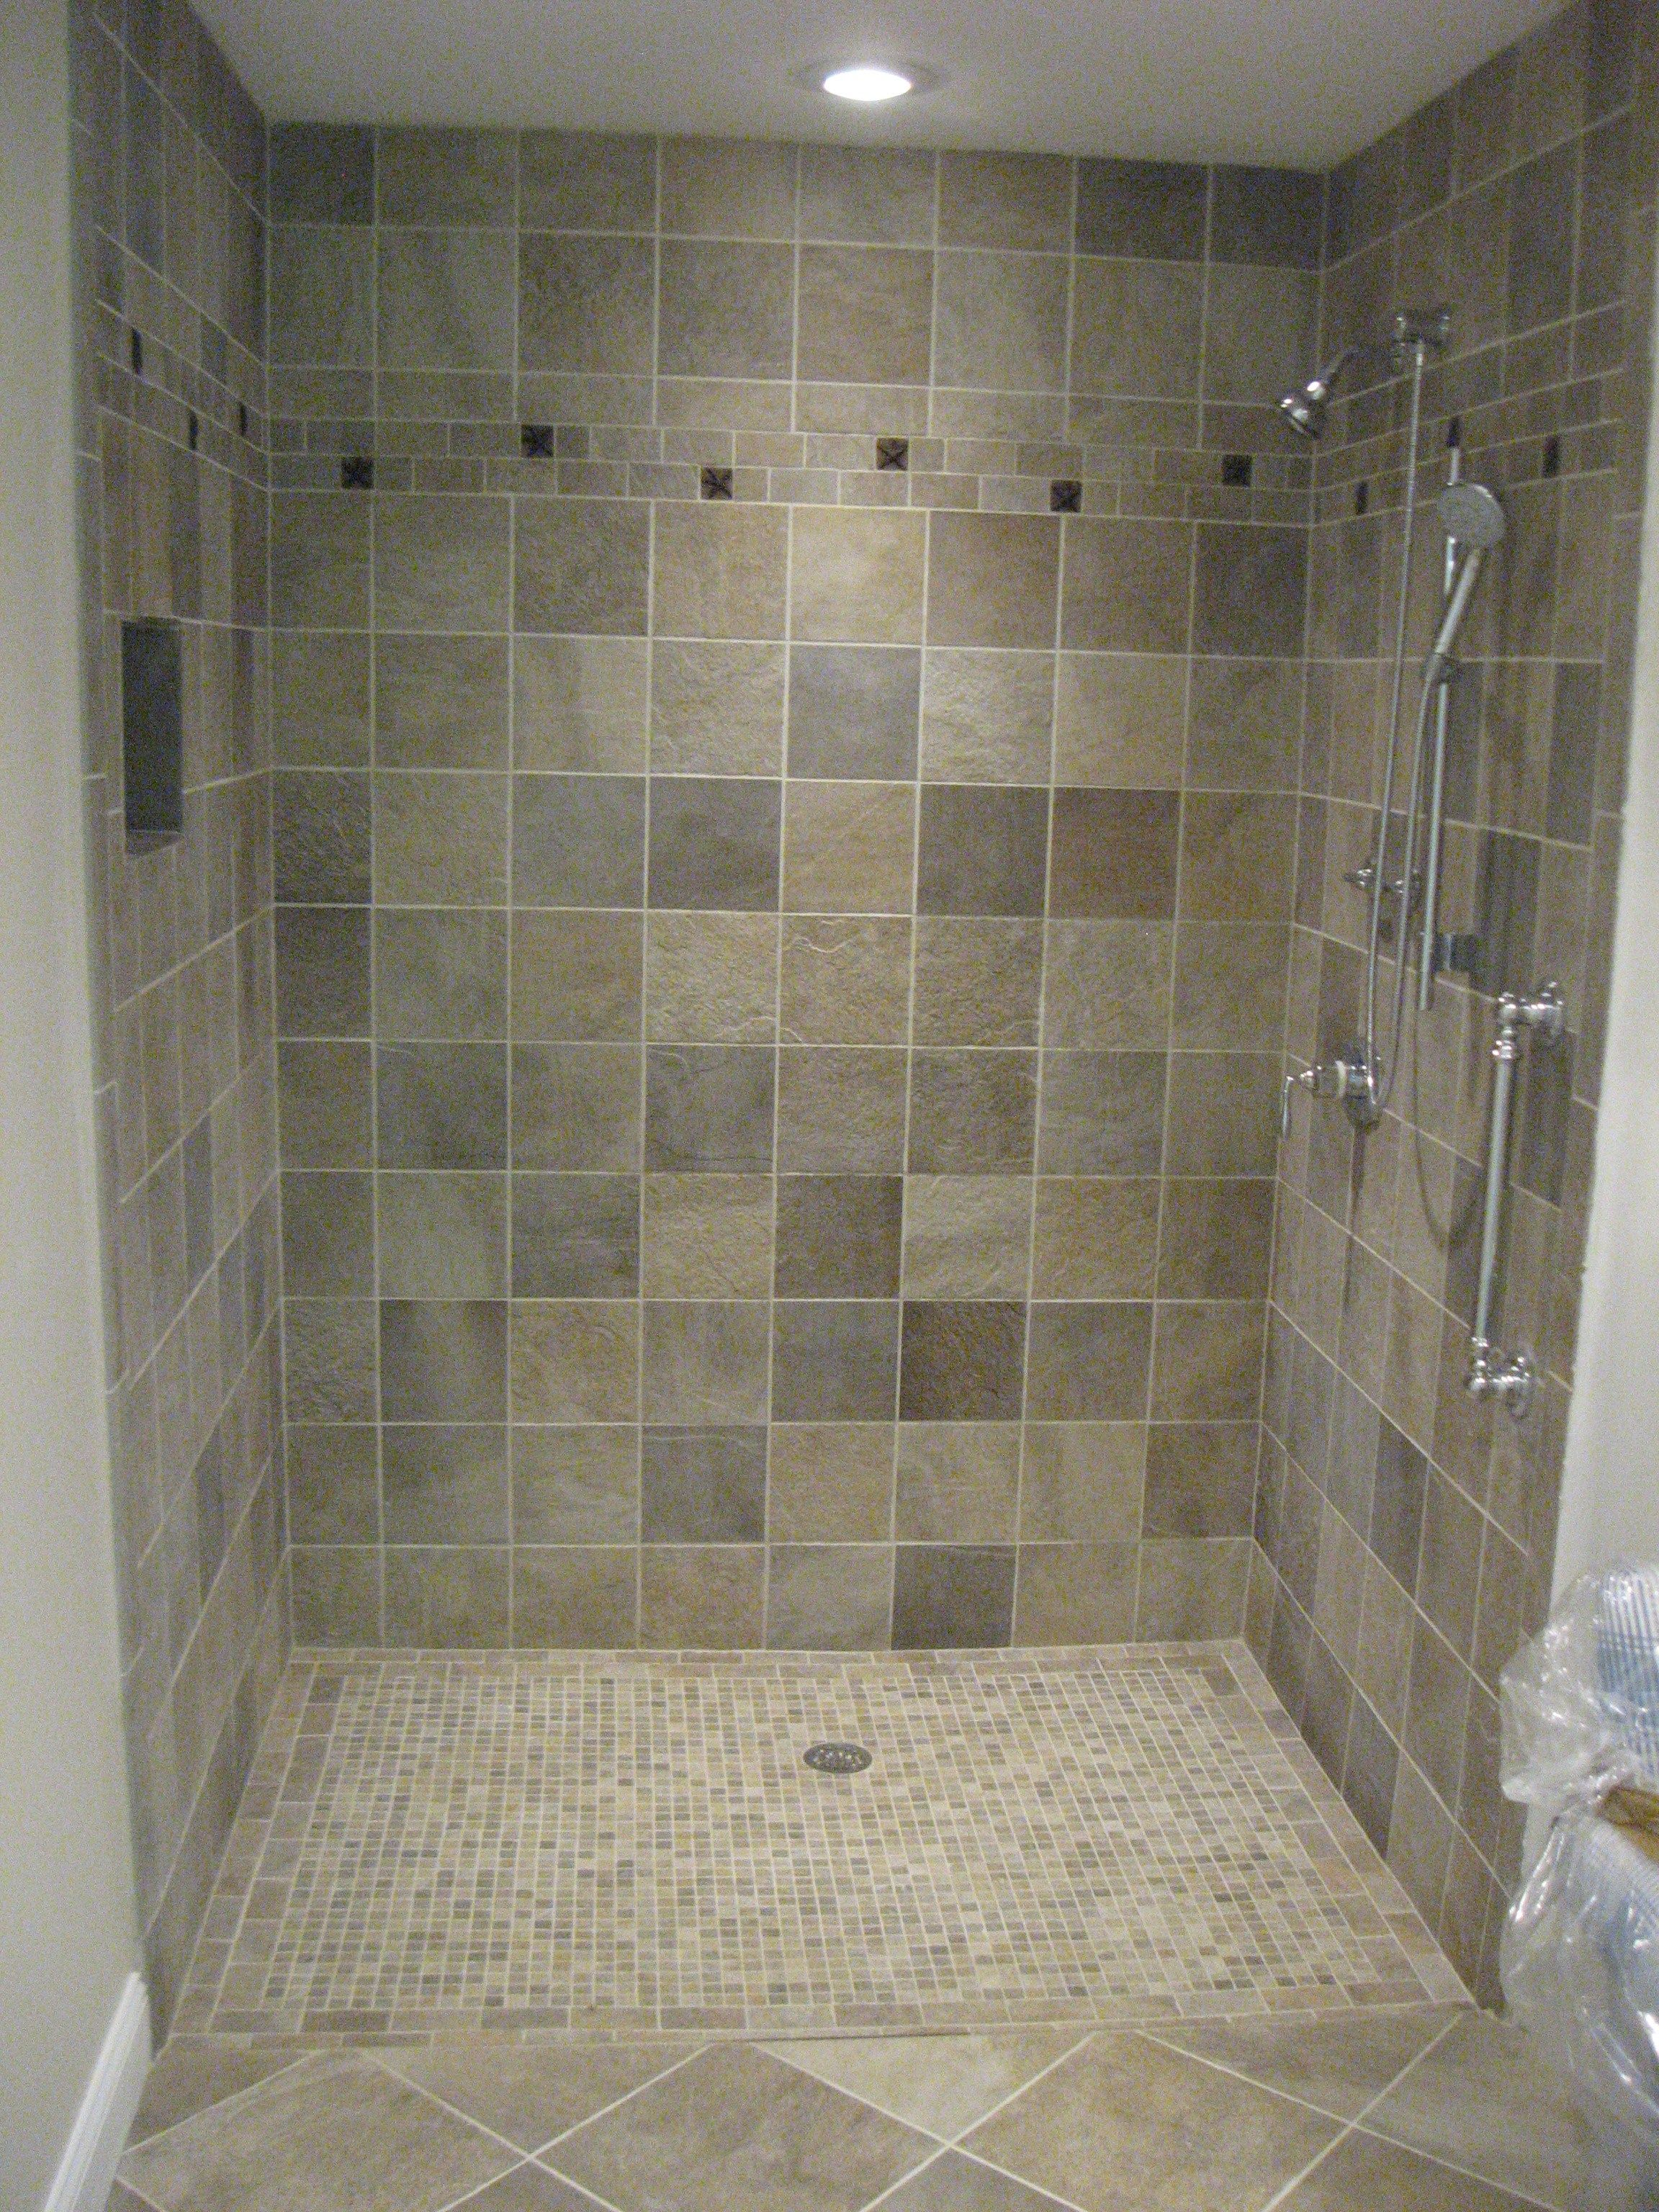 bathroom faucet mosaic tile flooring ideas marble tiled